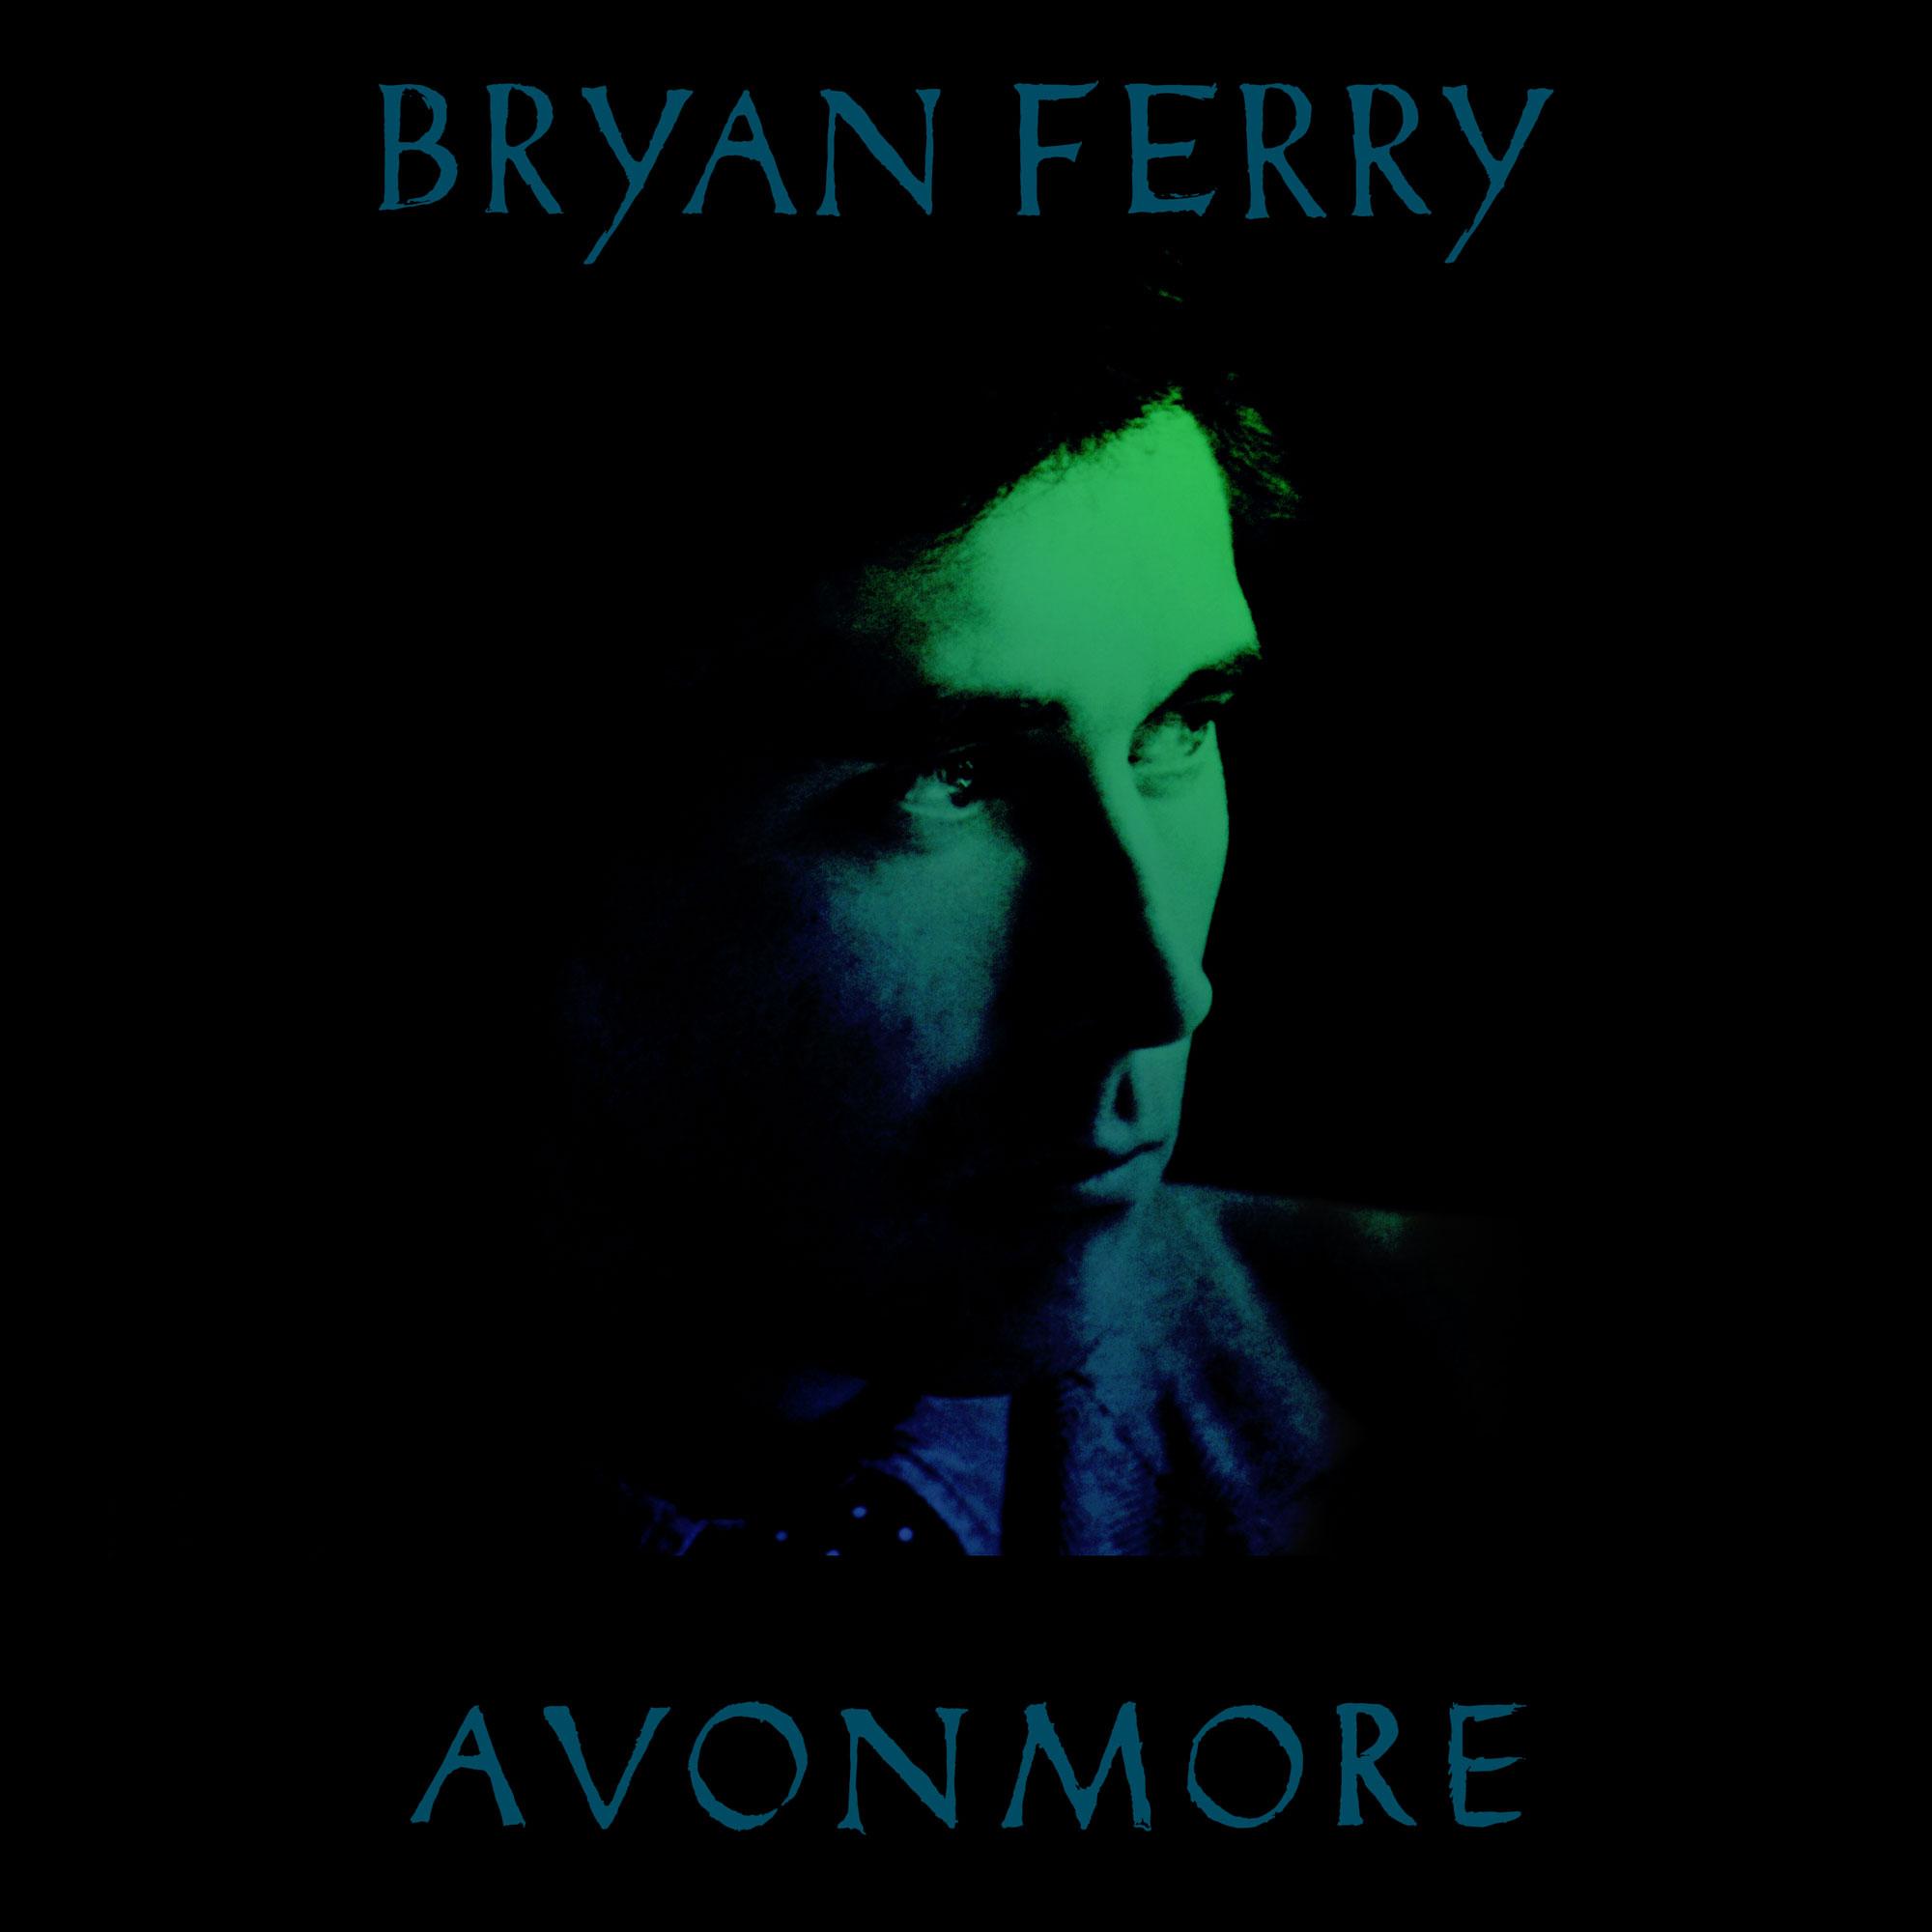 Bryan Ferry – Avonmore (Prins Thomas Remix)